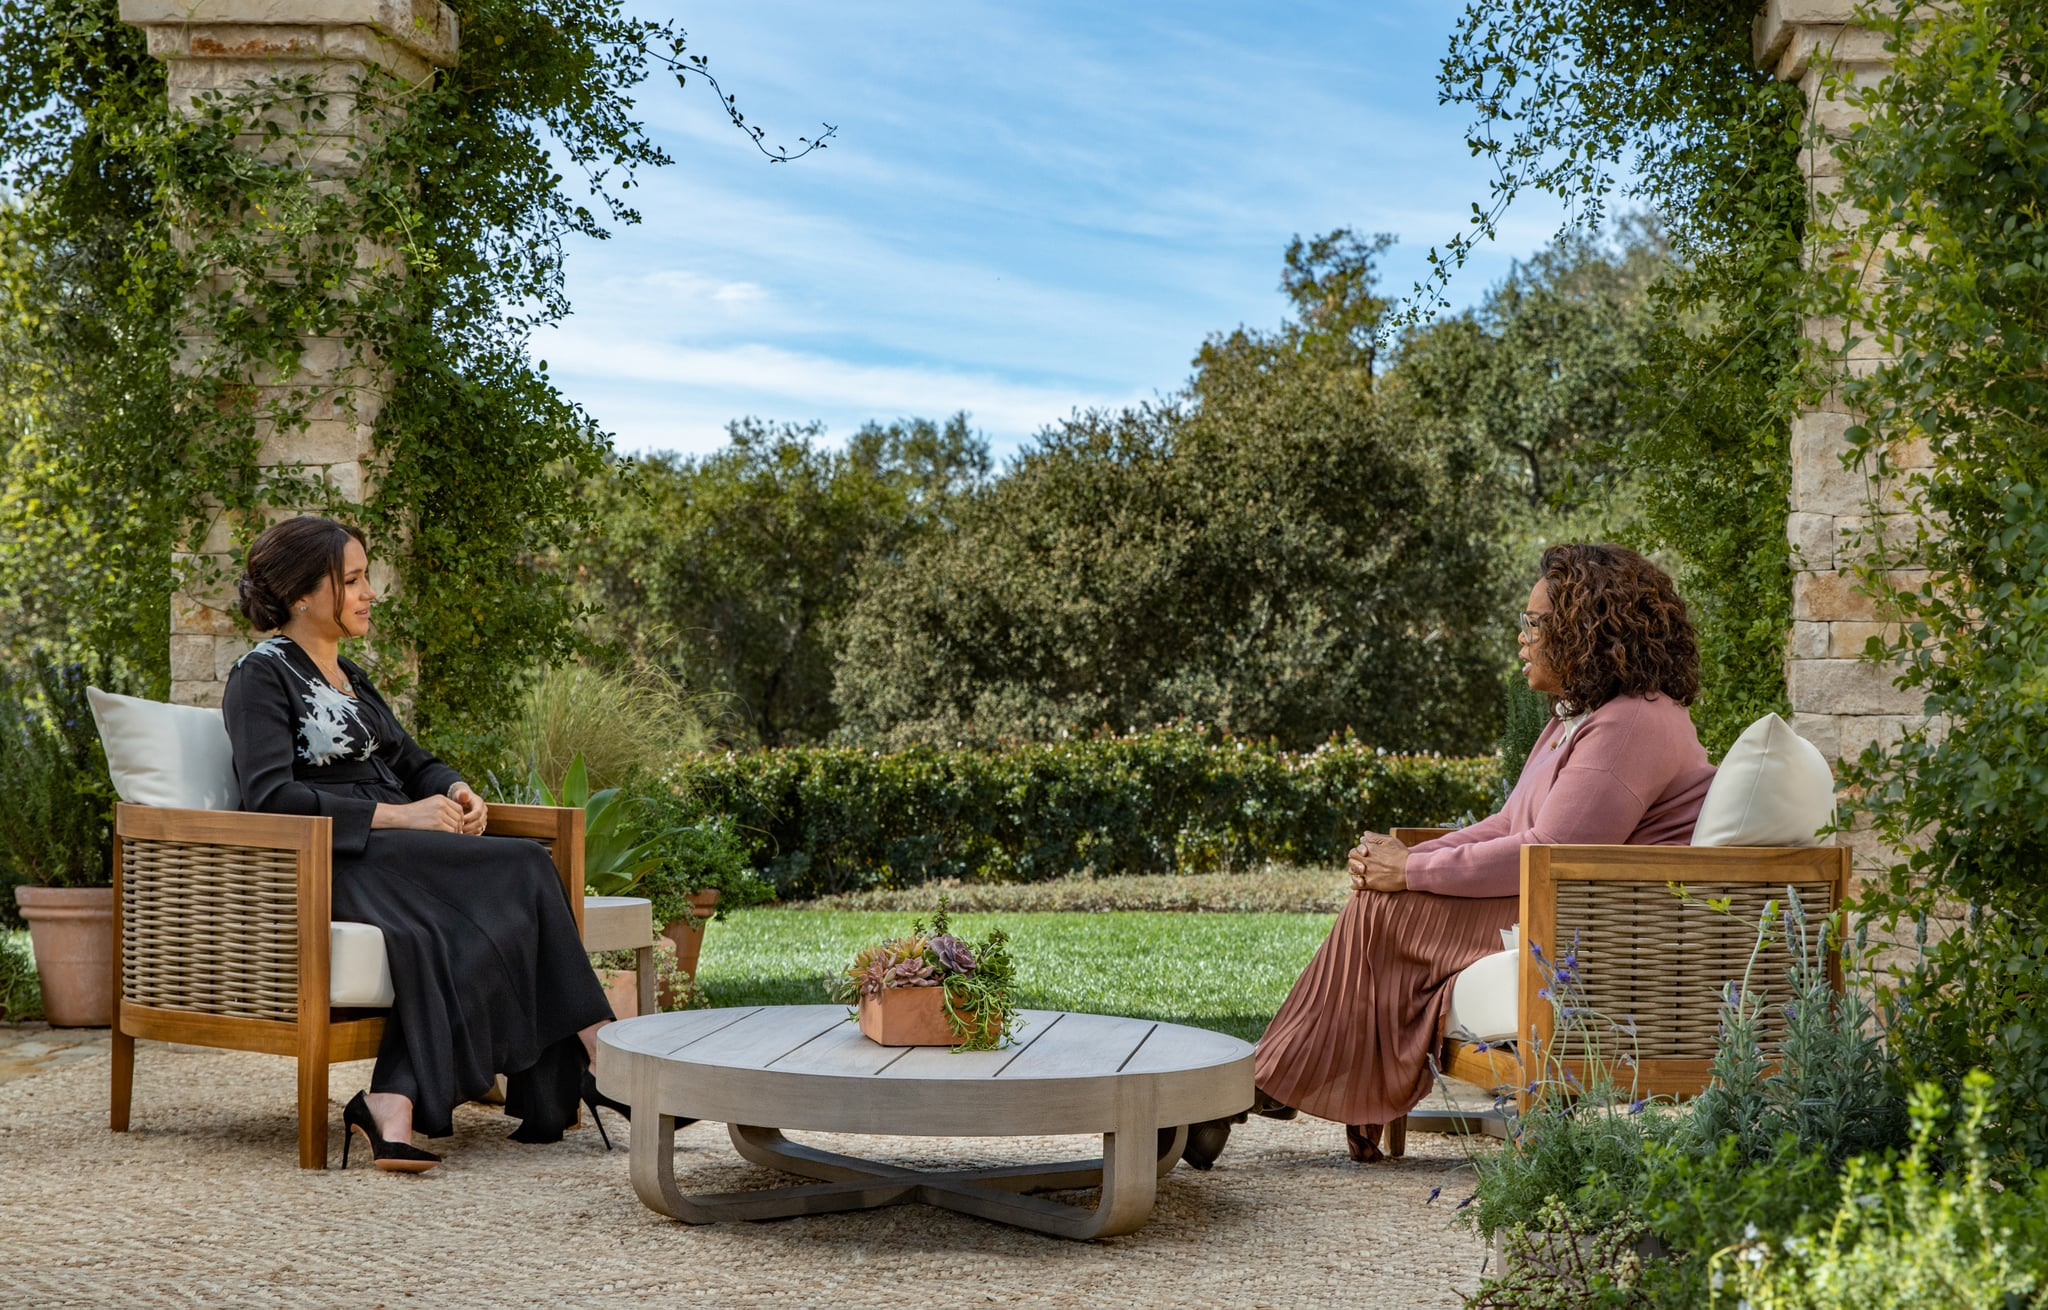 UNSPECIFIED - UNSPECIFIED: در این تصویر دستی که توسط Harpo Productions ارائه شده و در 5 مارس 2021 منتشر شده است ، اپرا وینفری در 7 مارس 2021 با شاهزاده هری و مگان مارکل در یک برنامه برتر CBS Primetime ویژه مصاحبه می کند. از طریق گتی ایماژ)